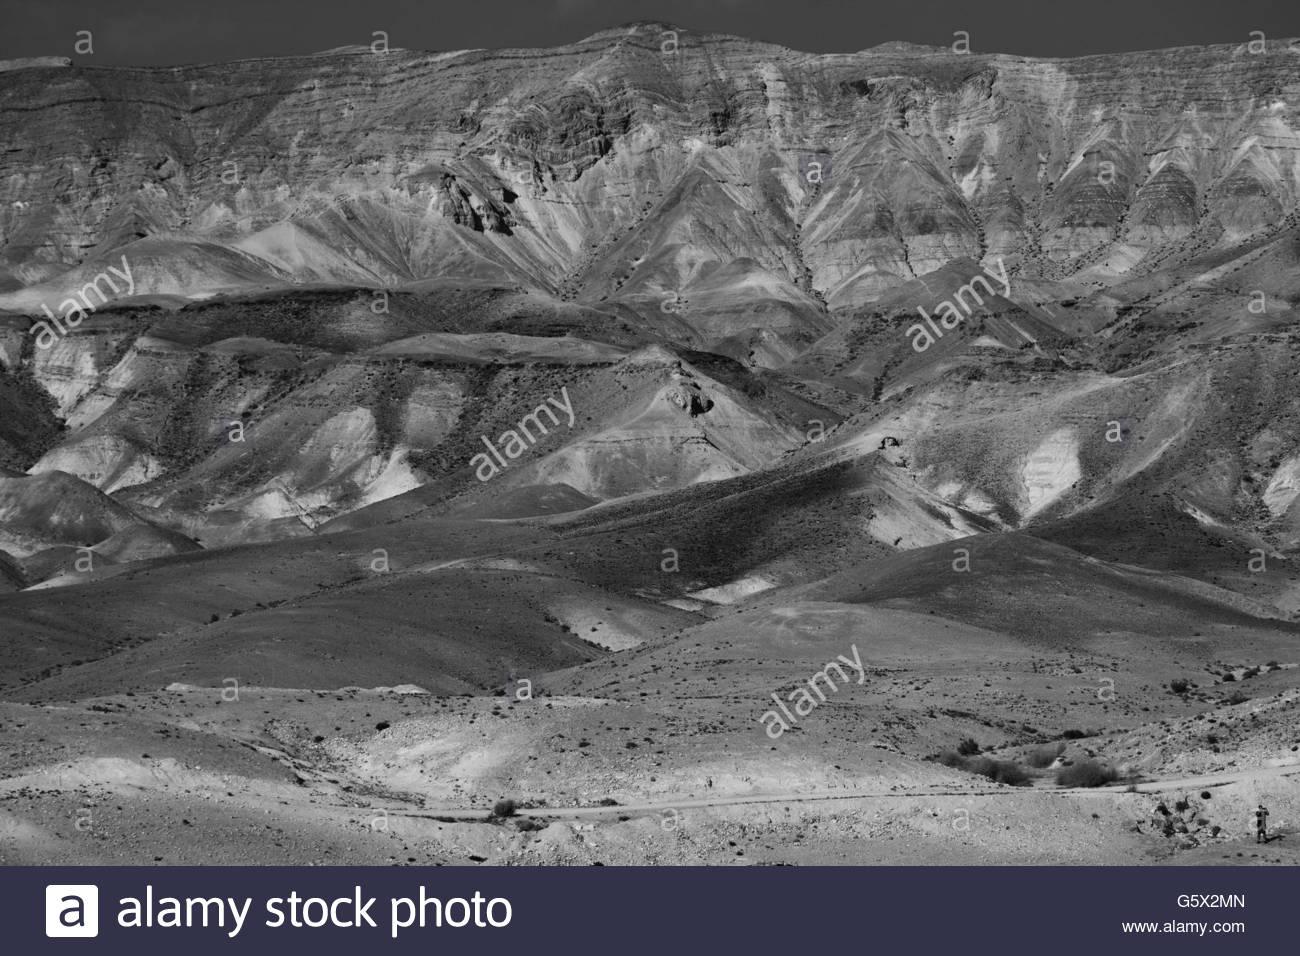 Man taking photos in the Judean Desert - Stock Image